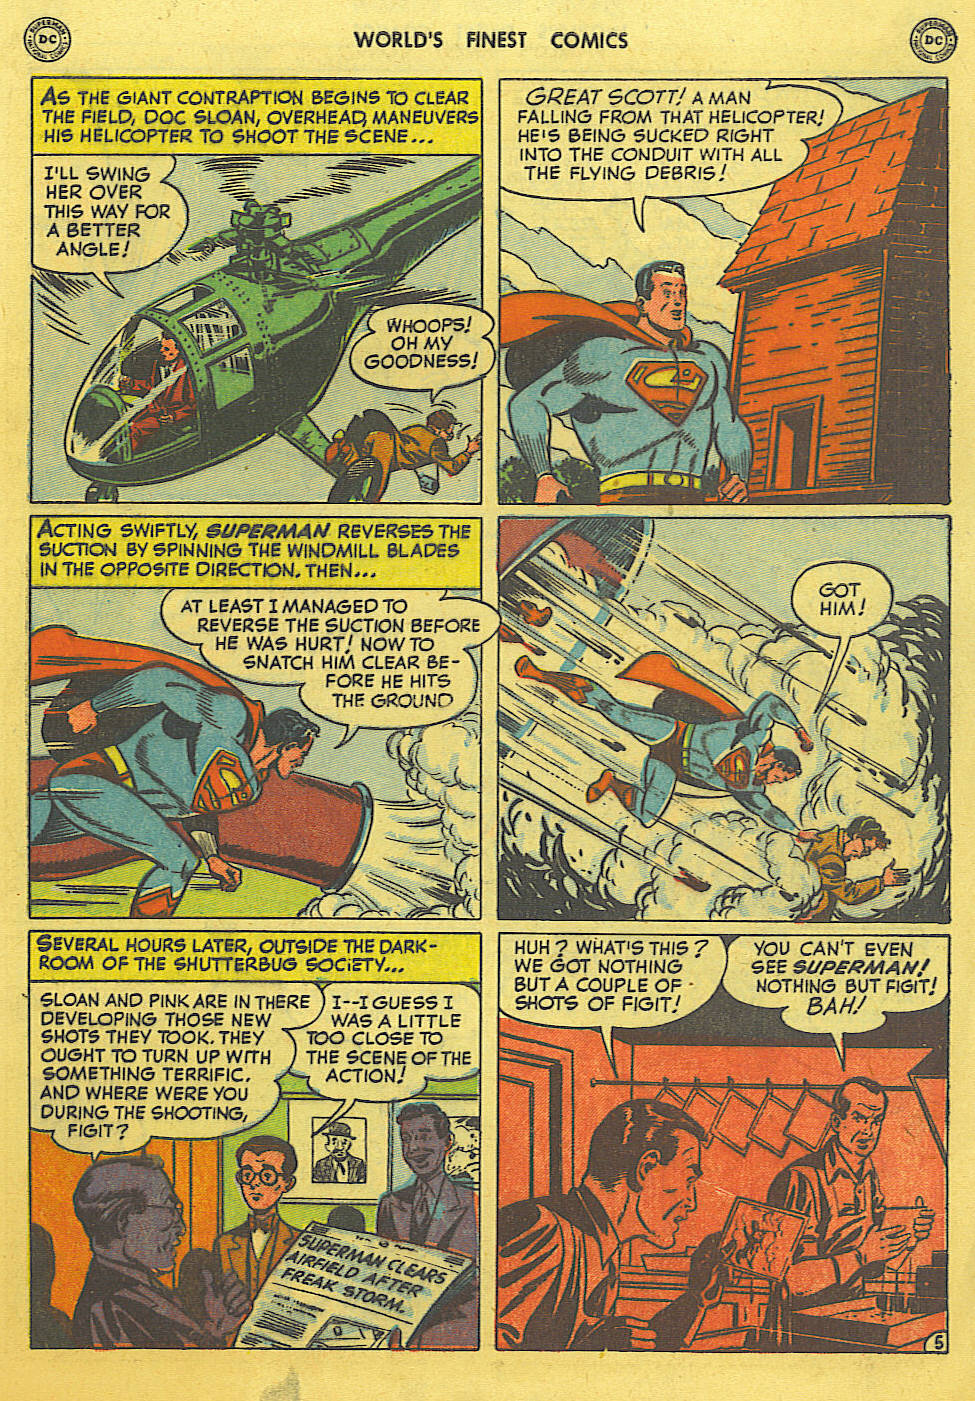 Read online World's Finest Comics comic -  Issue #49 - 7